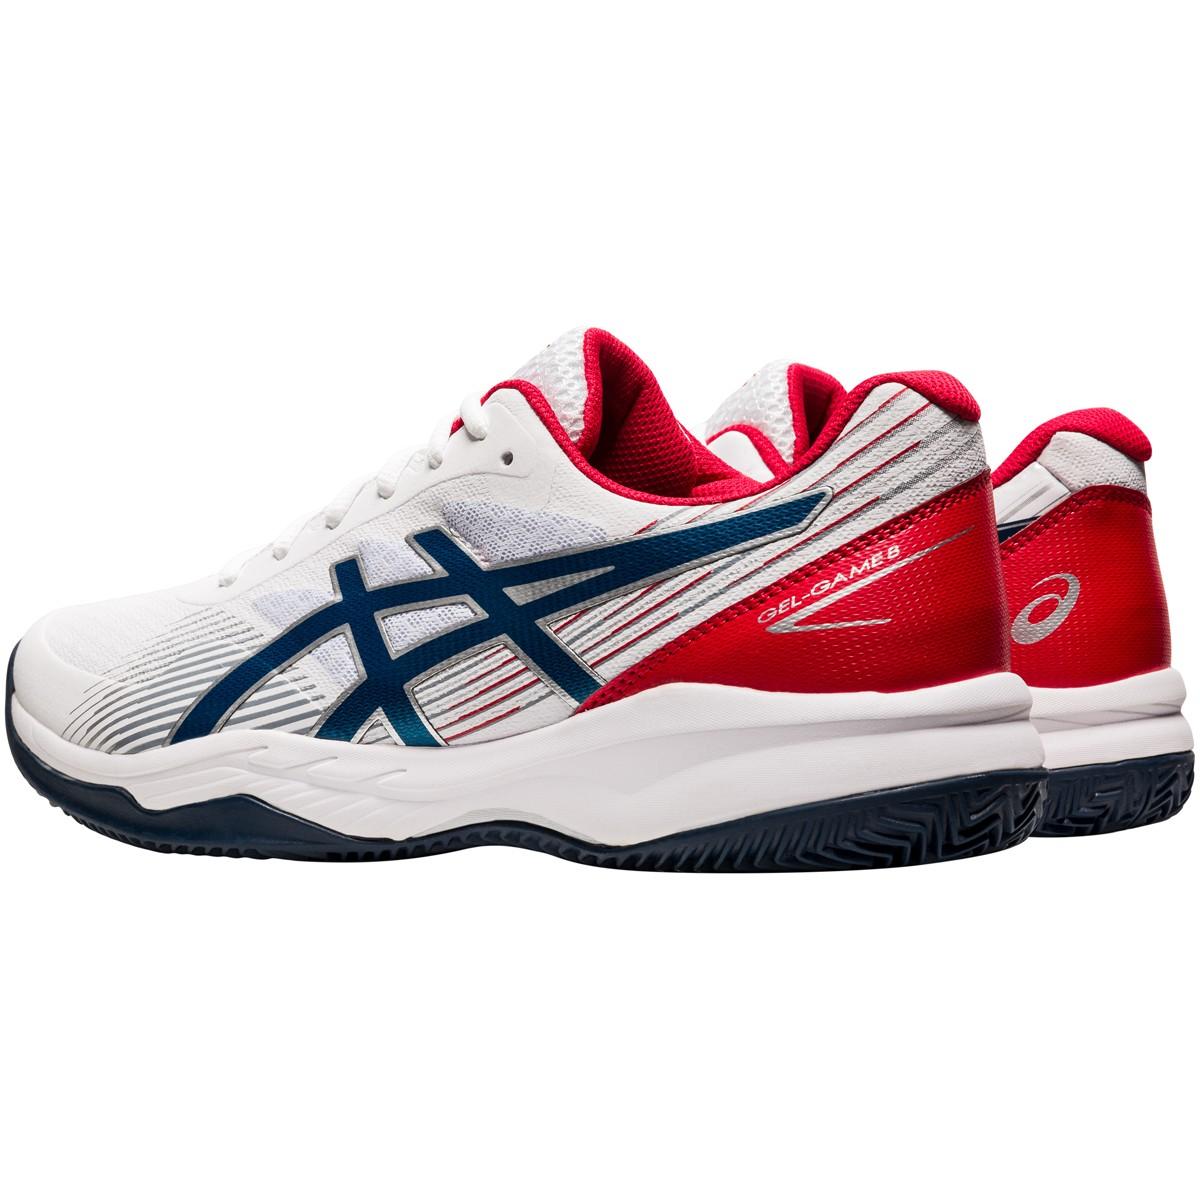 ASICS GEL GAME 8 CLAY COURT SHOES - ASICS - Men's - Shoes | Tennispro